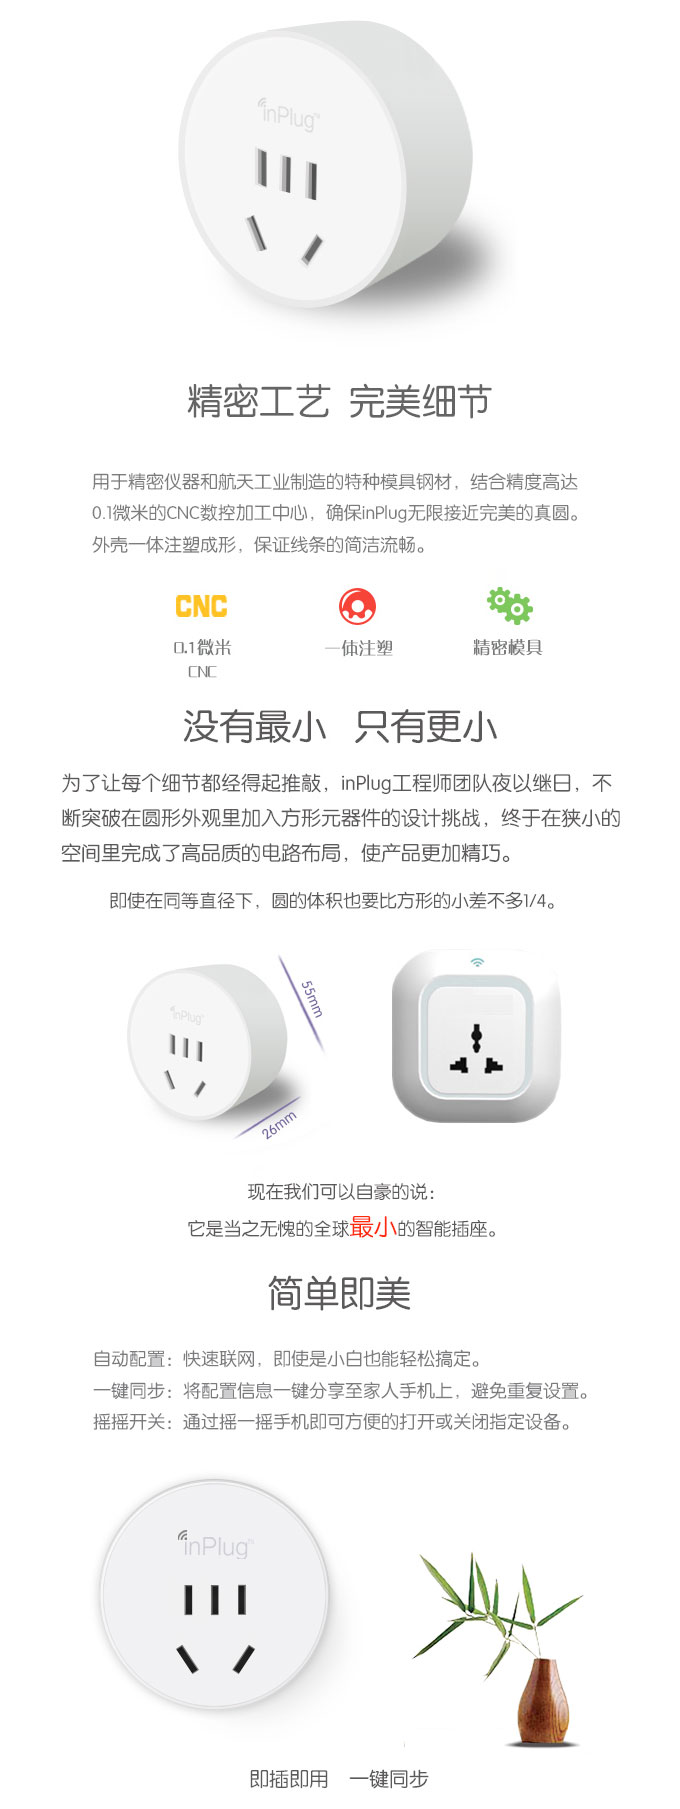 inPlug硬糖 WiFi智能插座